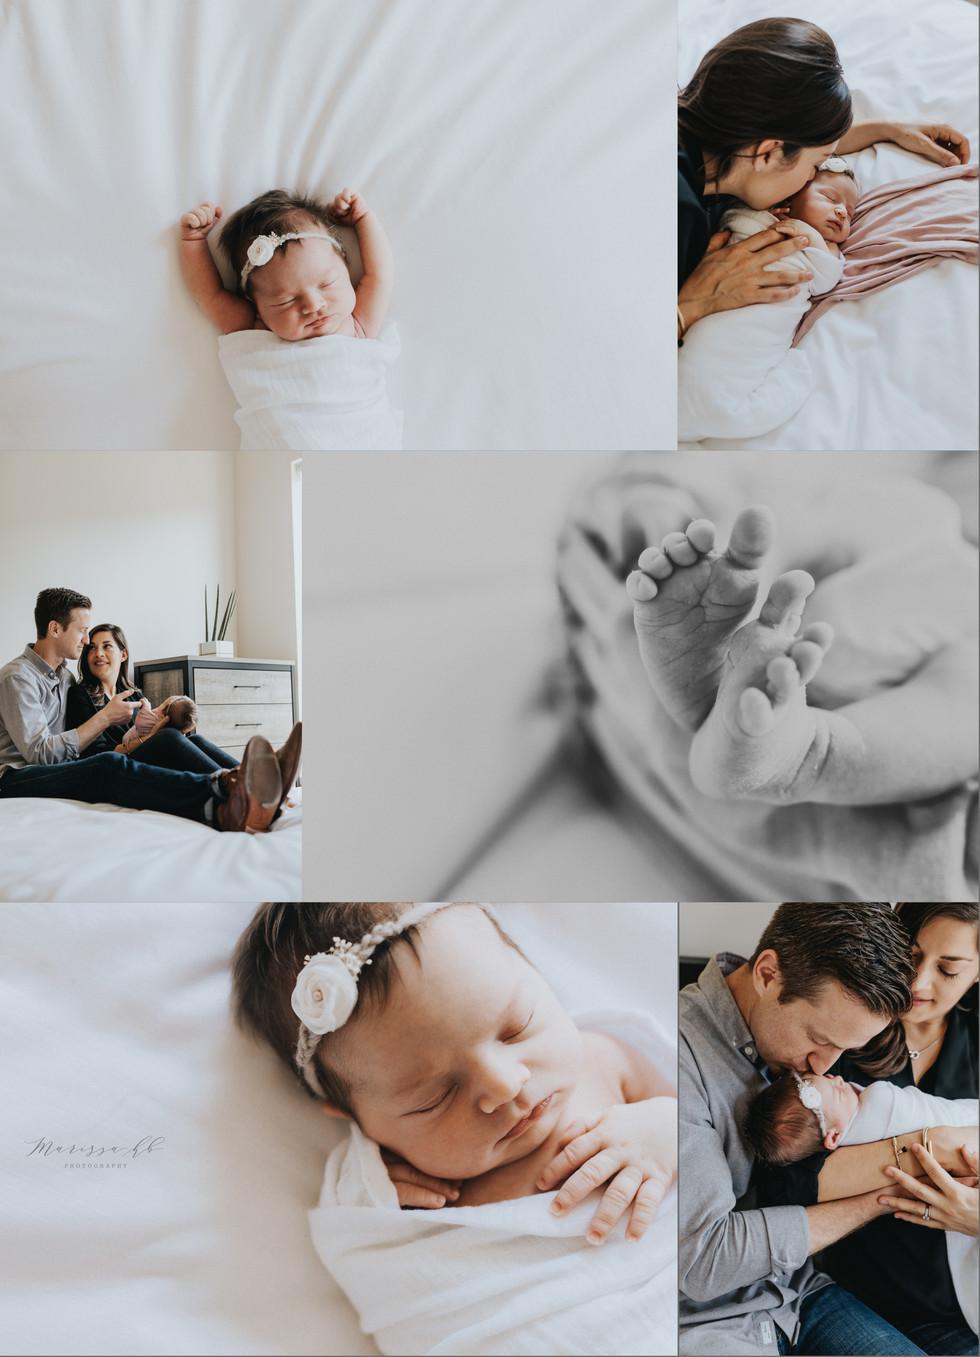 San Francisco Lifestyle Newborn Session | Marissa HB Photography